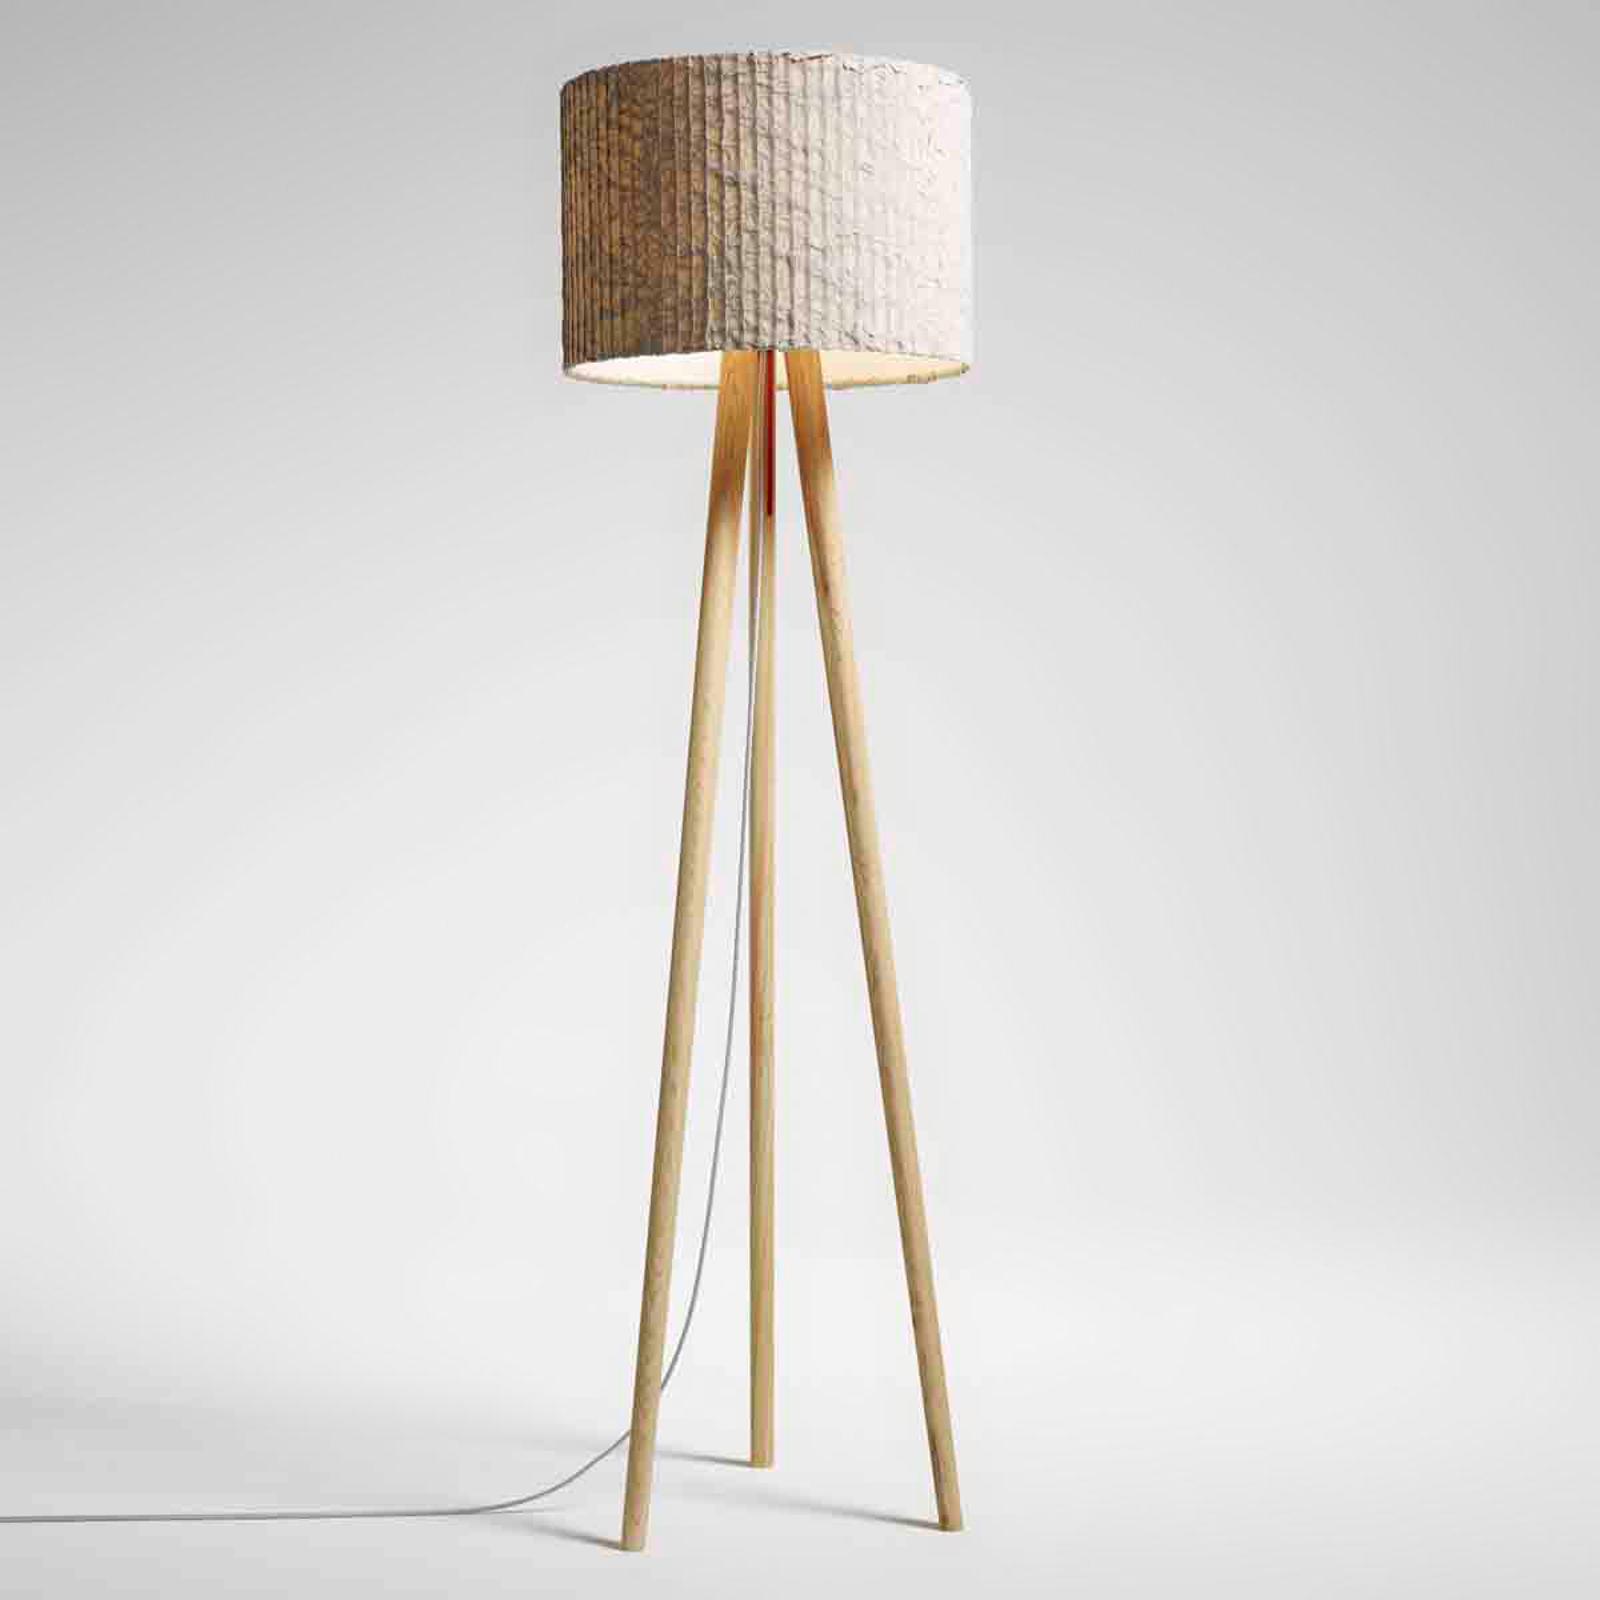 Stojací lampa Sten Cloud, bílý dub, oblázek